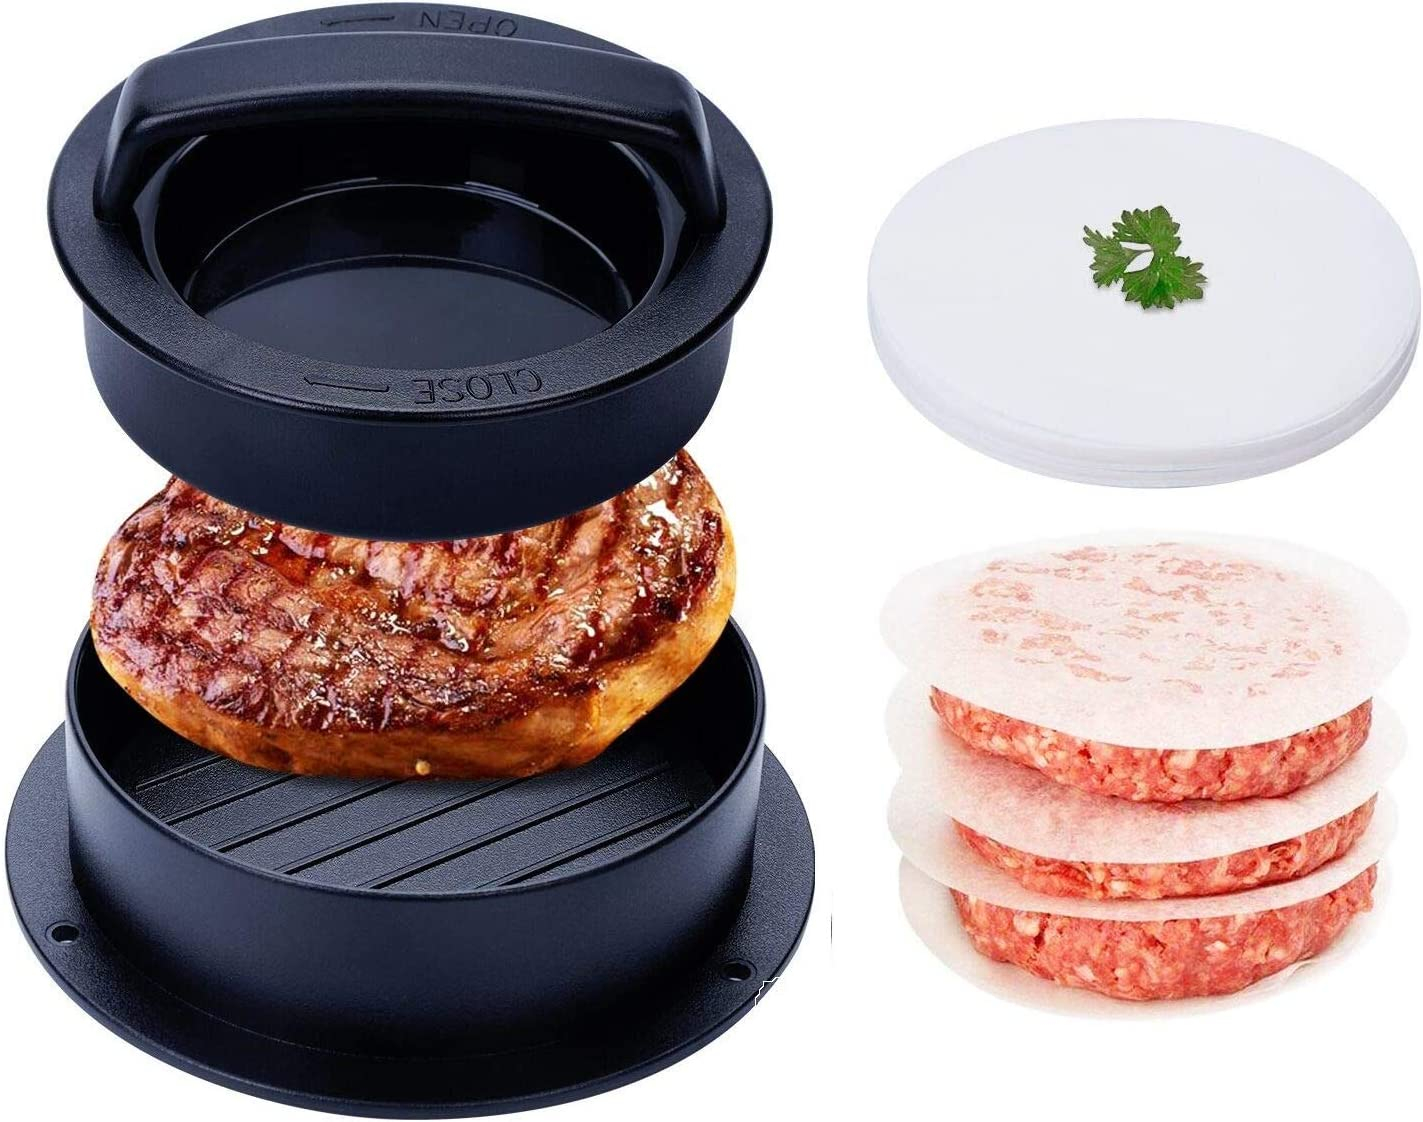 Black Cystarry 3-in-1 Stuffed Burger Press,Non-Stick Patty Mold for Making Stuffed Burgers,Sliders,Regular Beef Burger